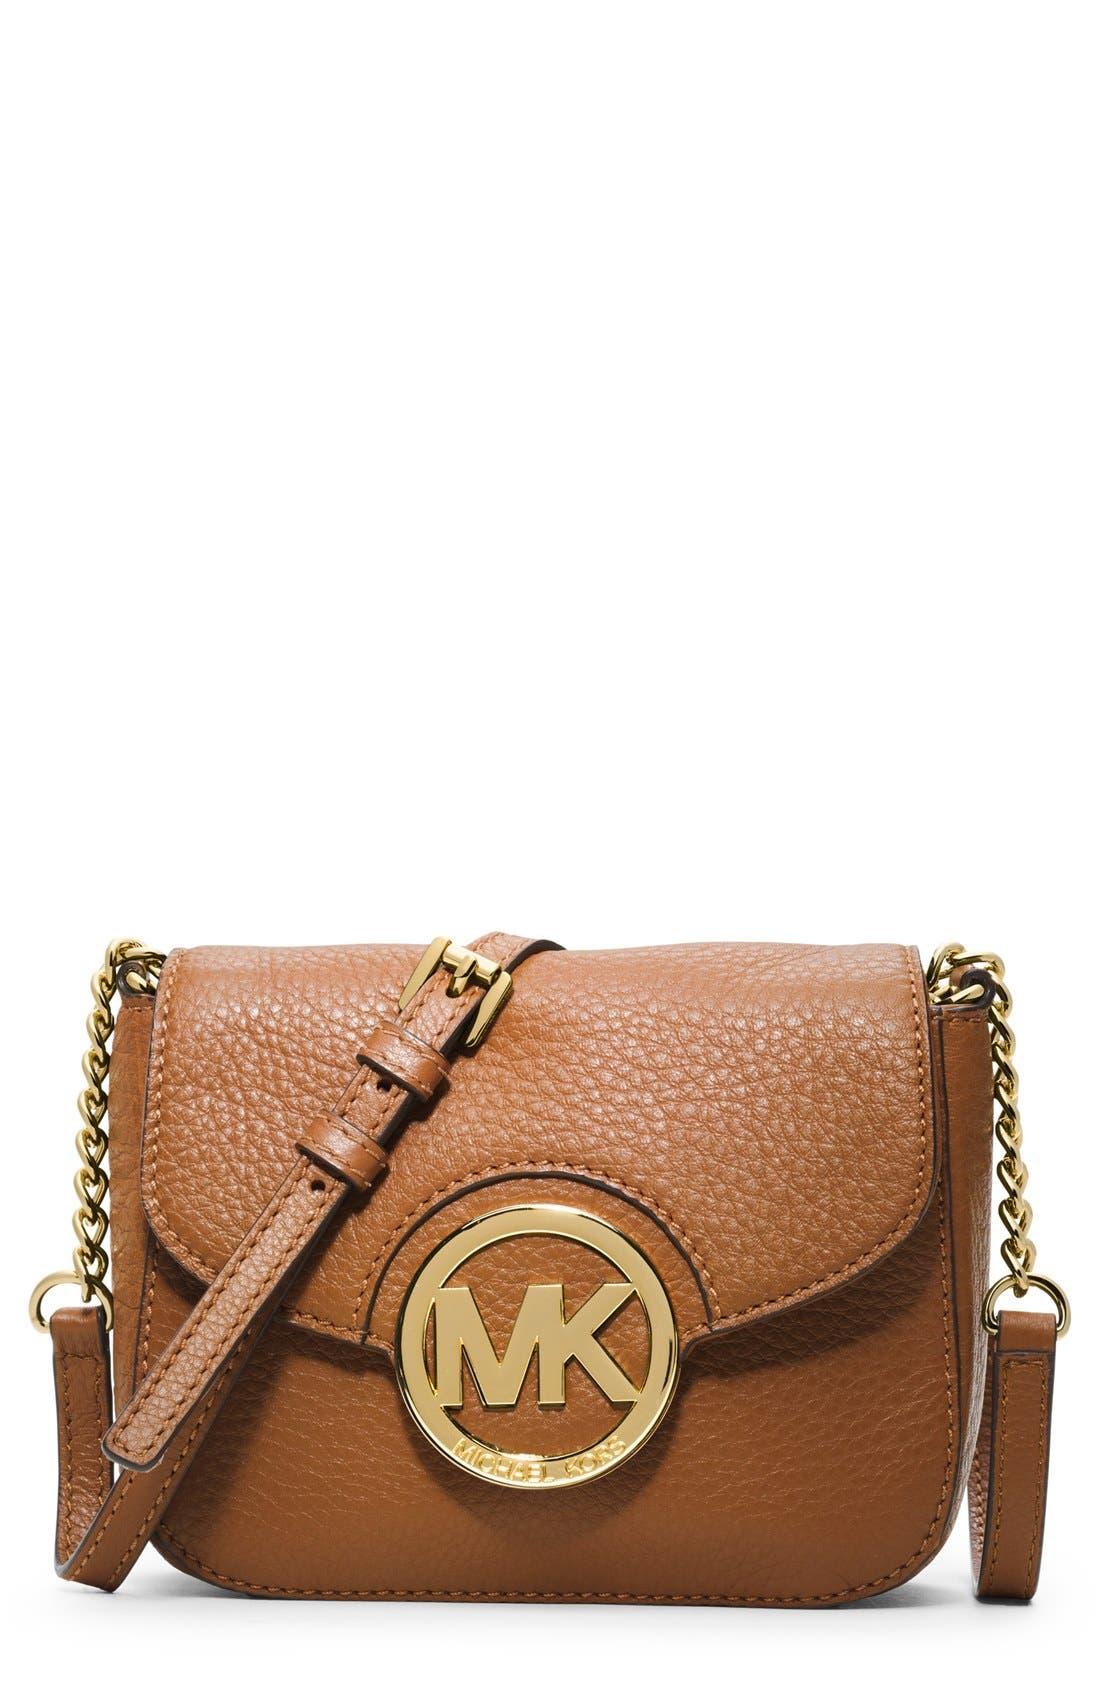 Alternate Image 1 Selected - MICHAEL Michael Kors 'Small Fulton' Crossbody Bag